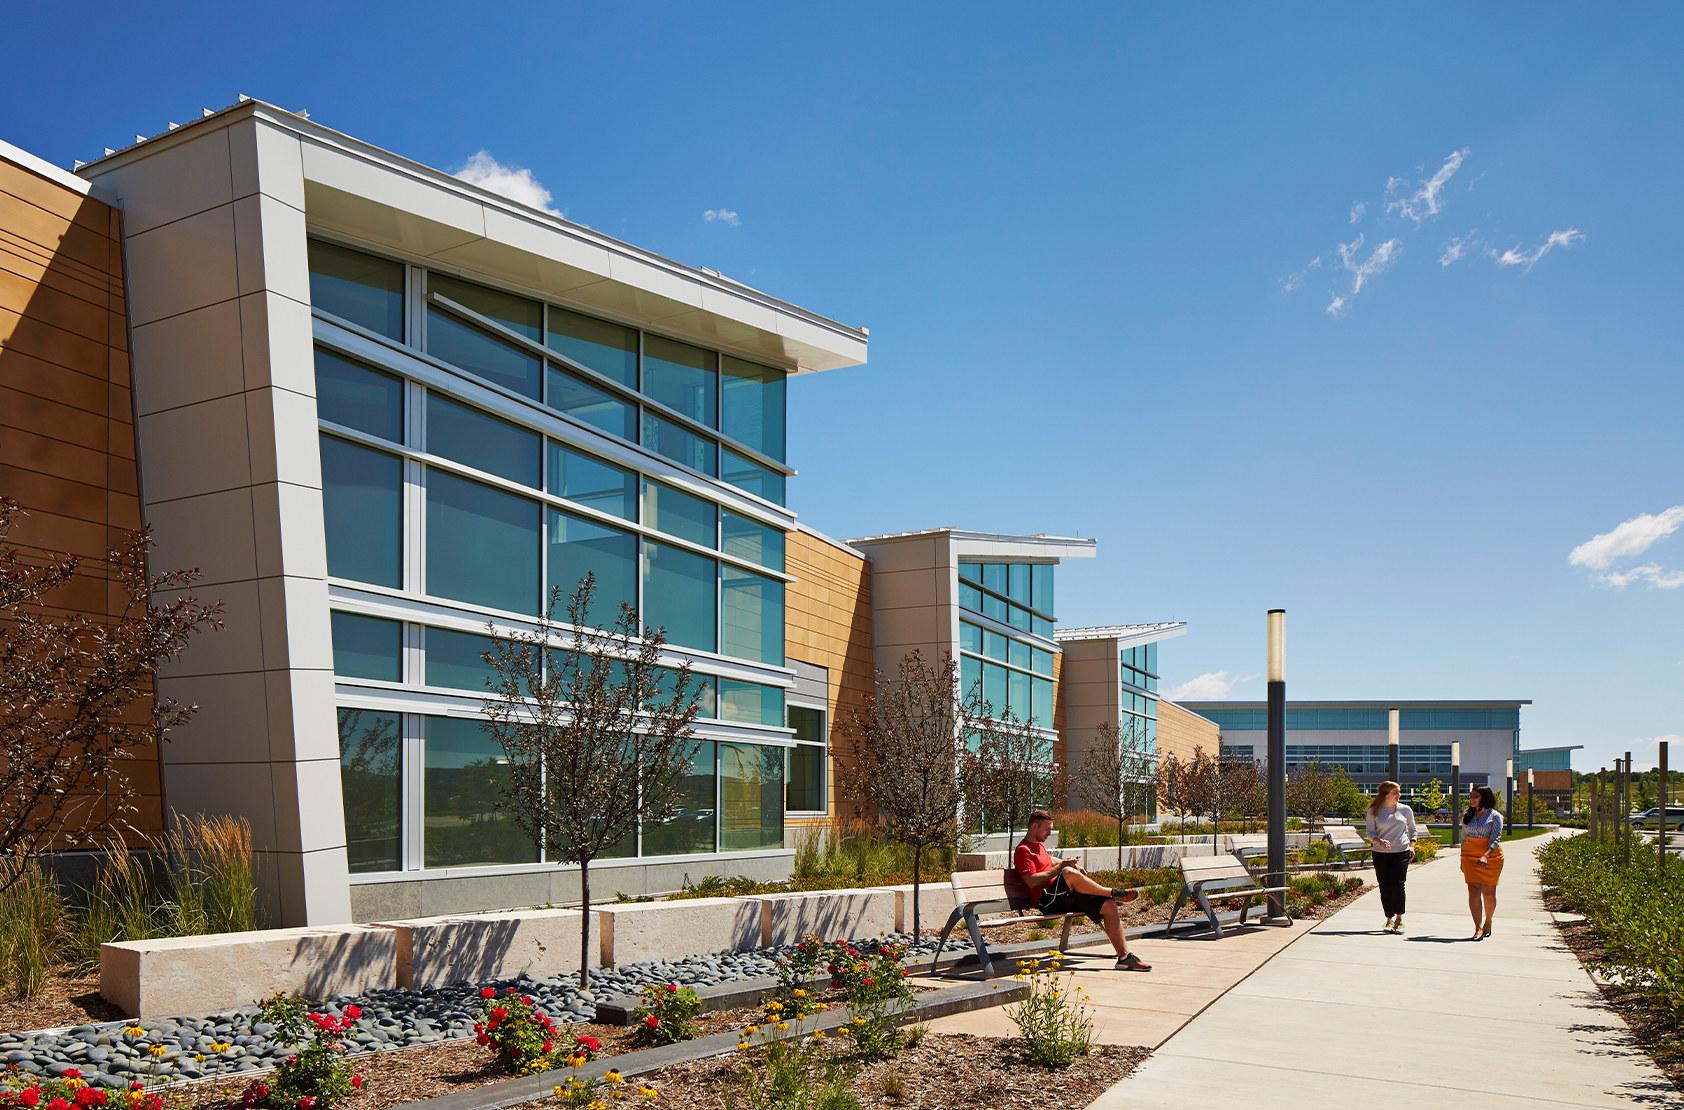 UW Health at the American Center - Satellite Hospital